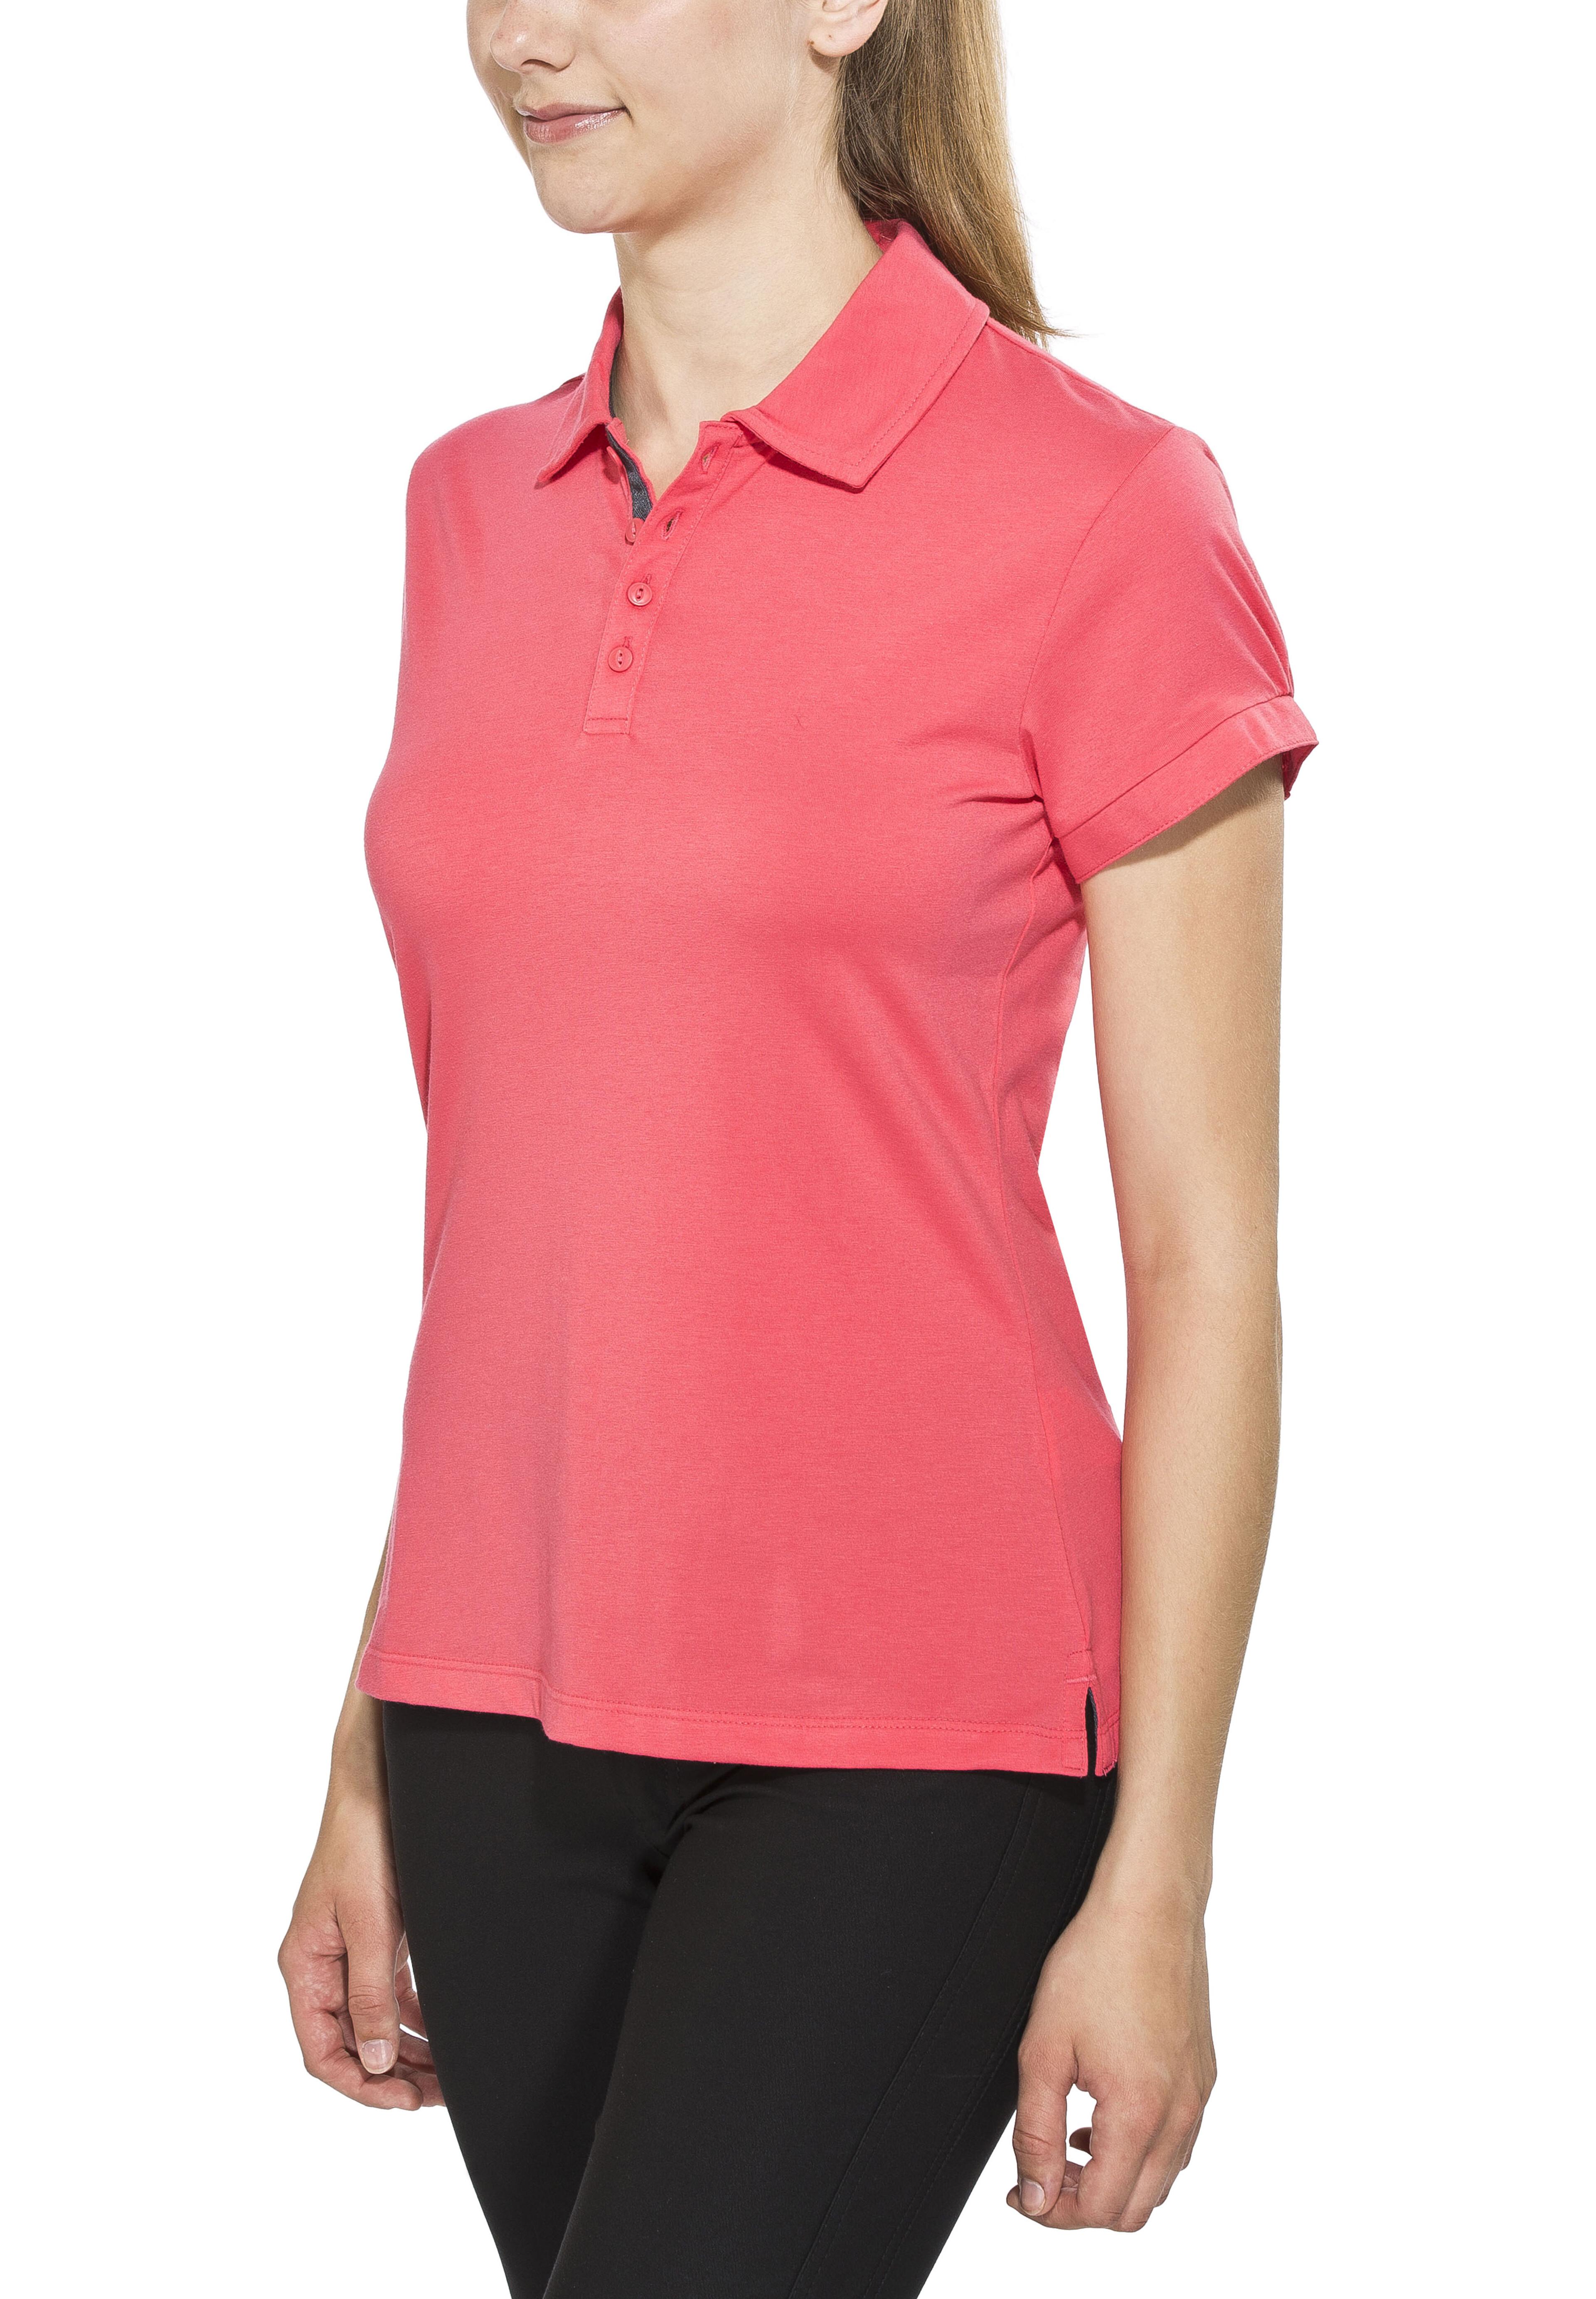 ffa9638c89d Columbia Splendid Summer Shortsleeve Shirt Women pink at Addnature.co.uk